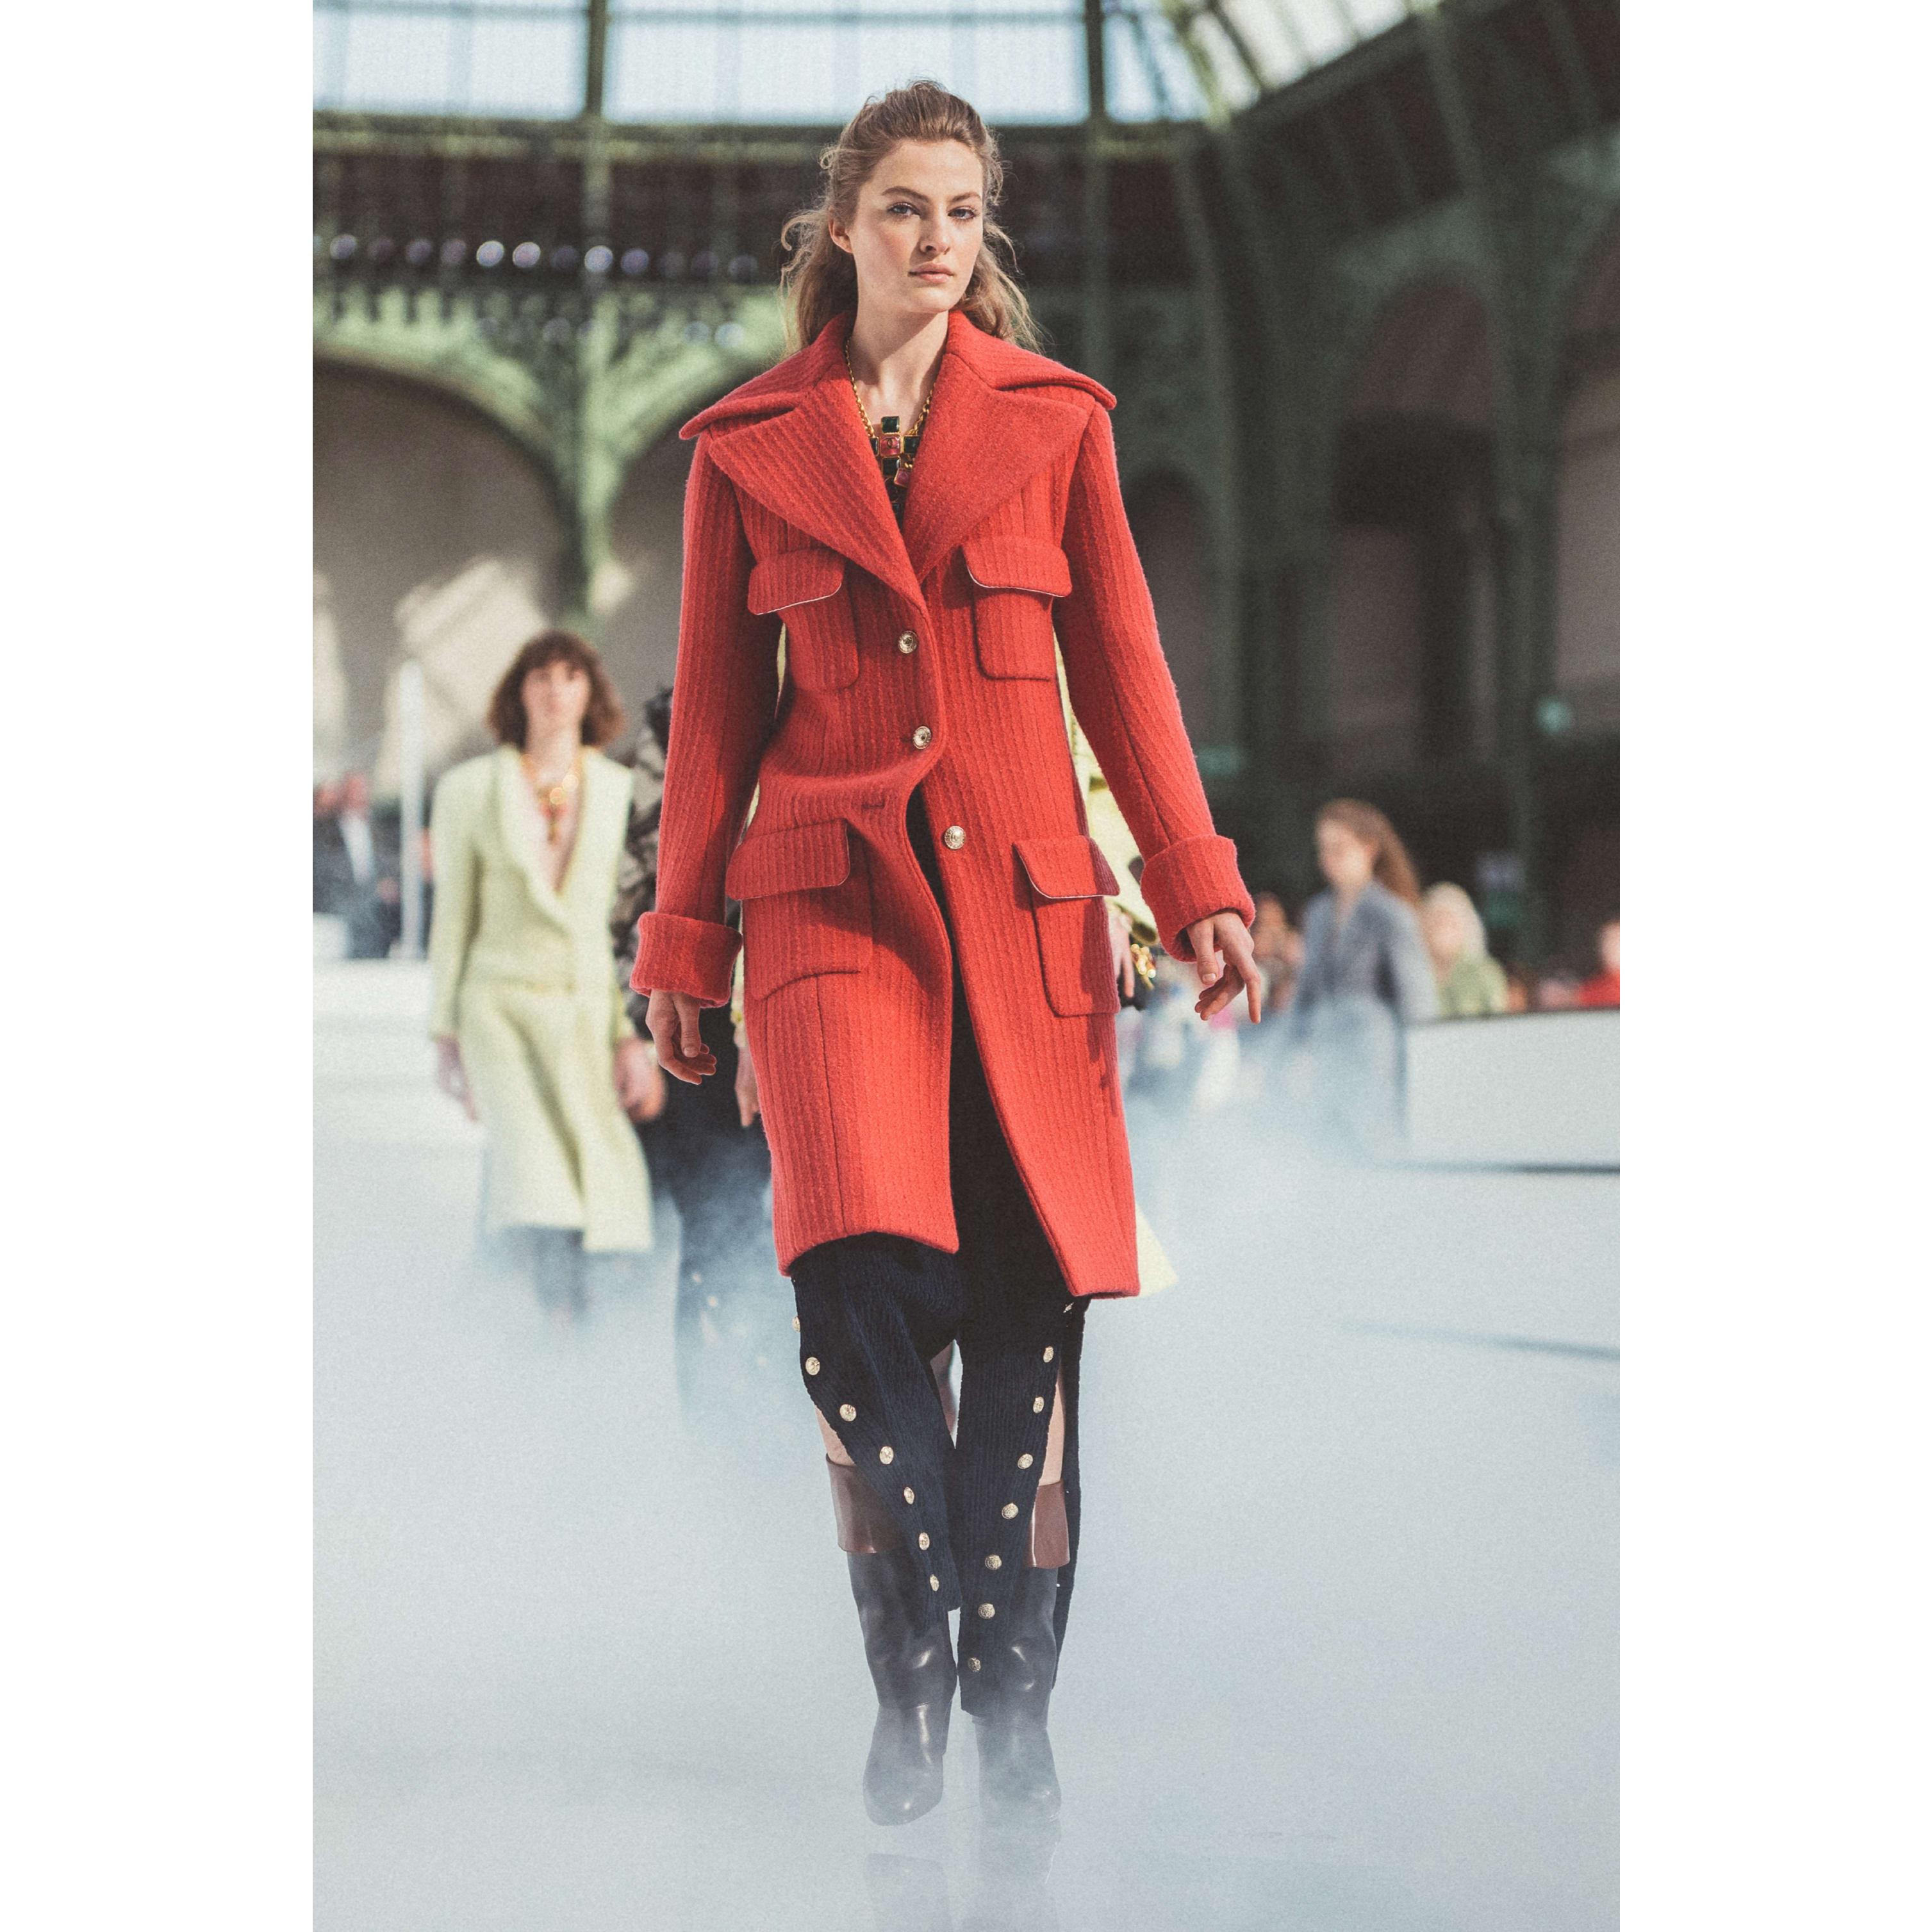 Casaco - Raspberry Pink - Wool Tweed - CHANEL - Vista predefinida - ver a versão em tamanho standard